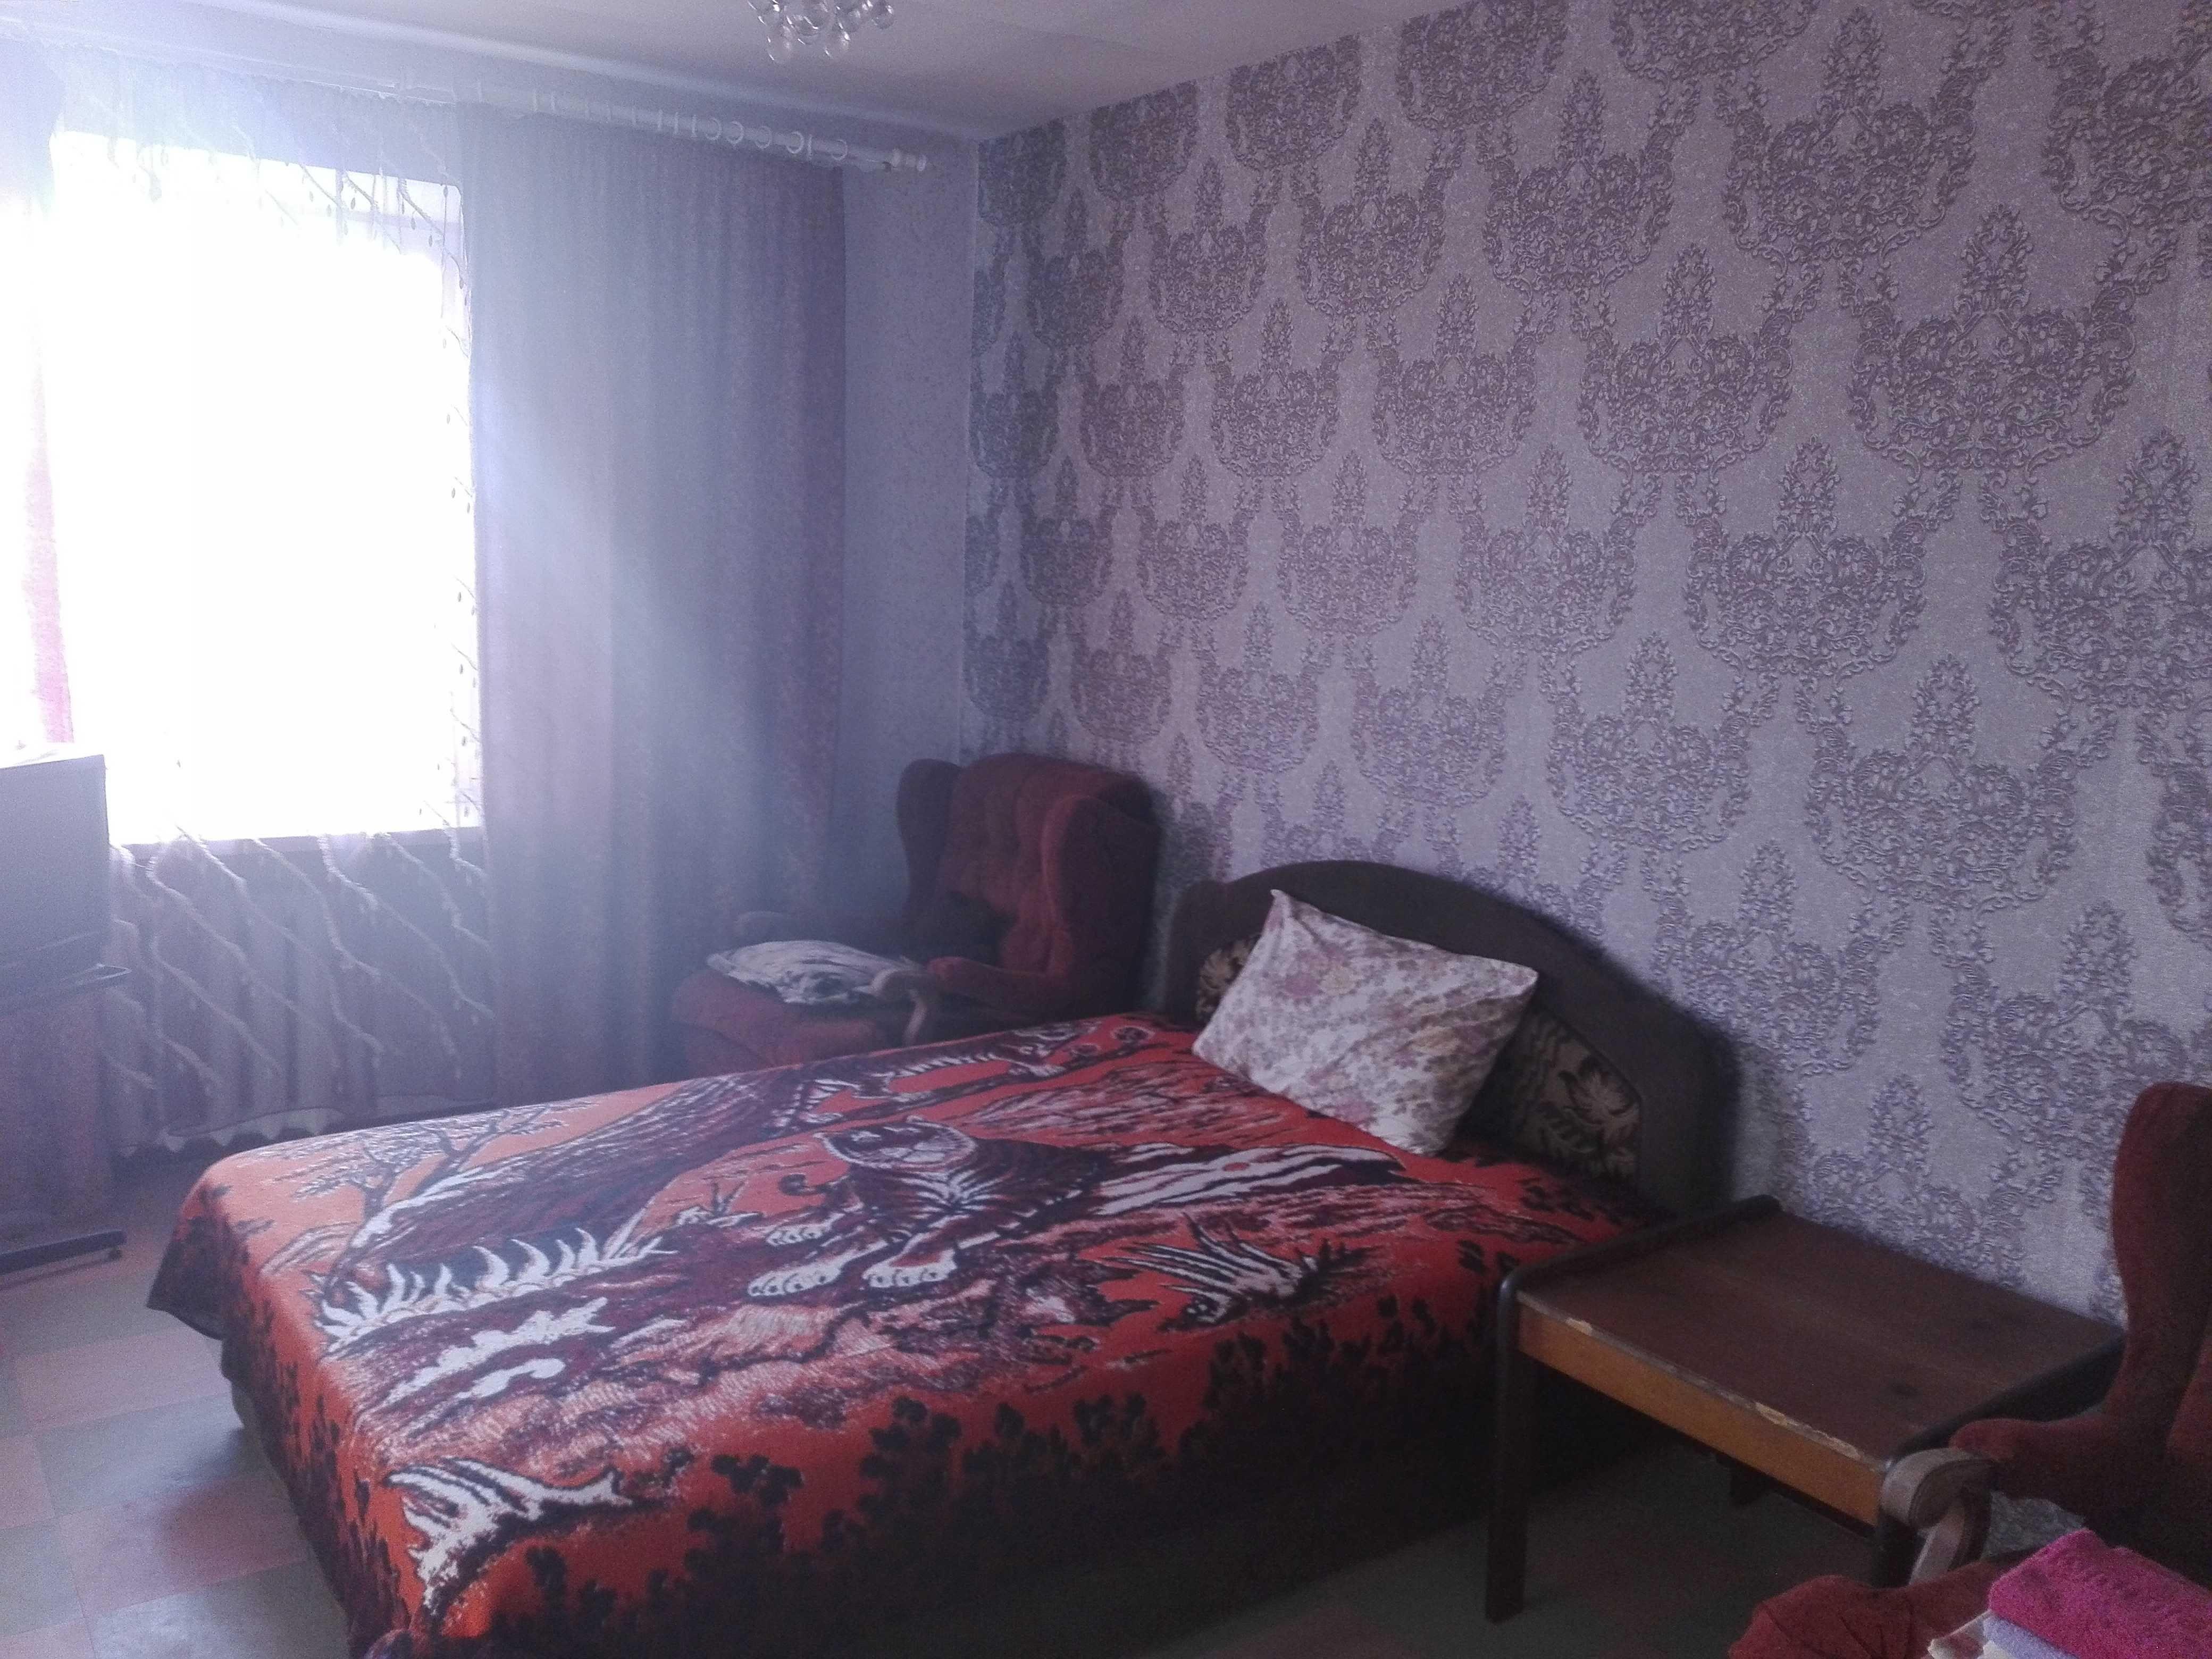 Квартира на Гагарина в районе подстанции. Чистая, аккуратная.